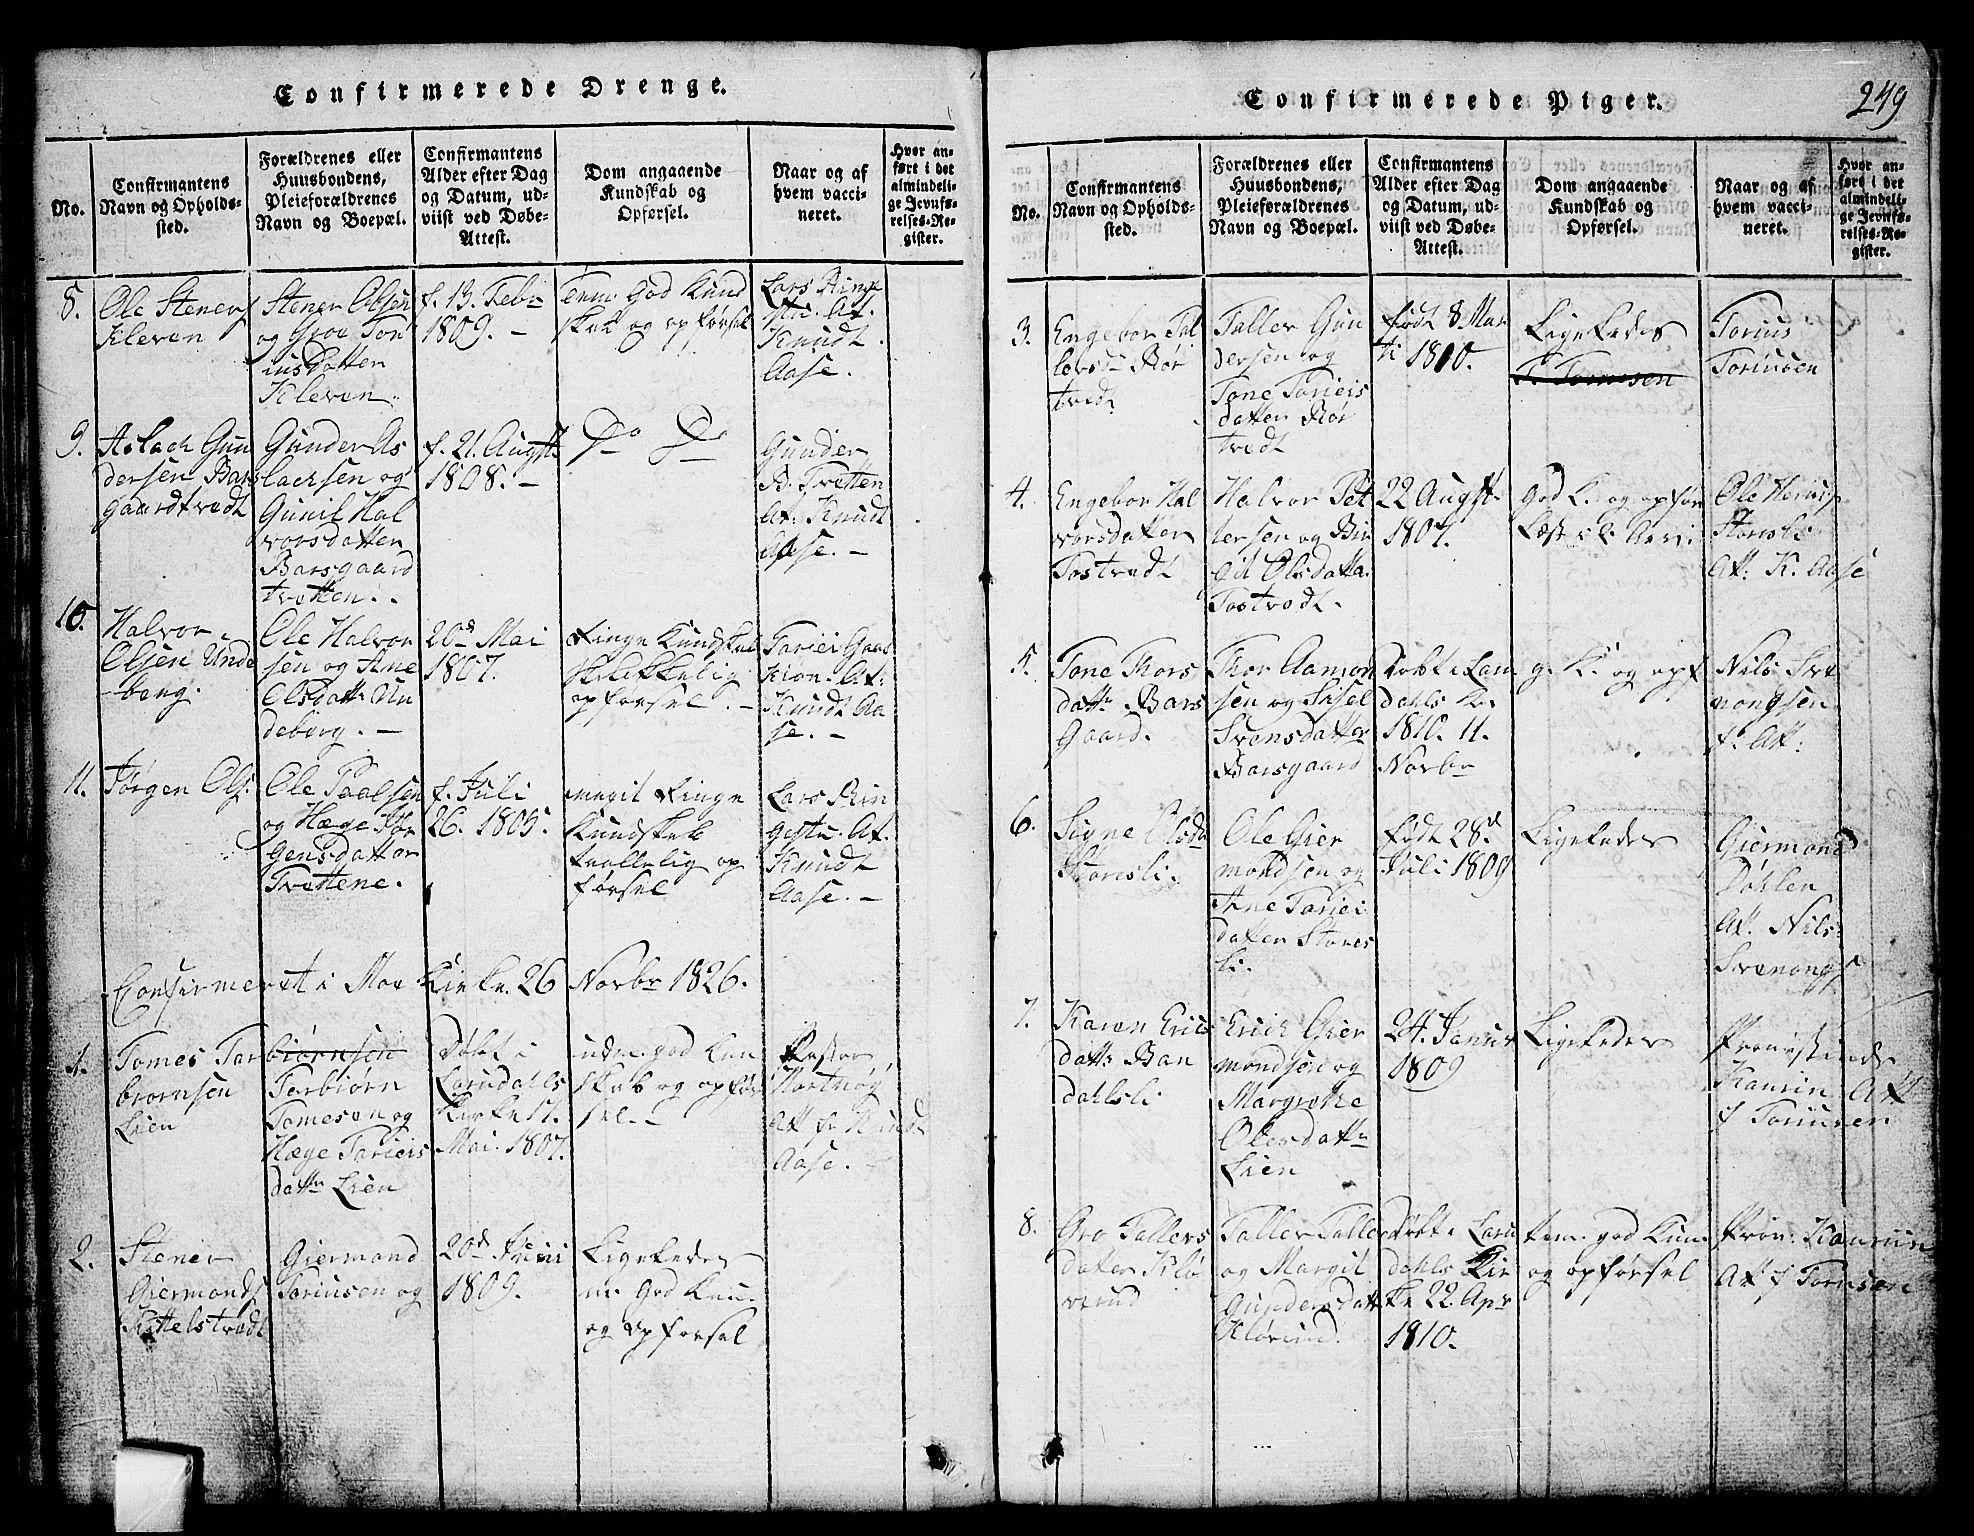 SAKO, Mo kirkebøker, G/Gb/L0001: Klokkerbok nr. II 1, 1814-1843, s. 249